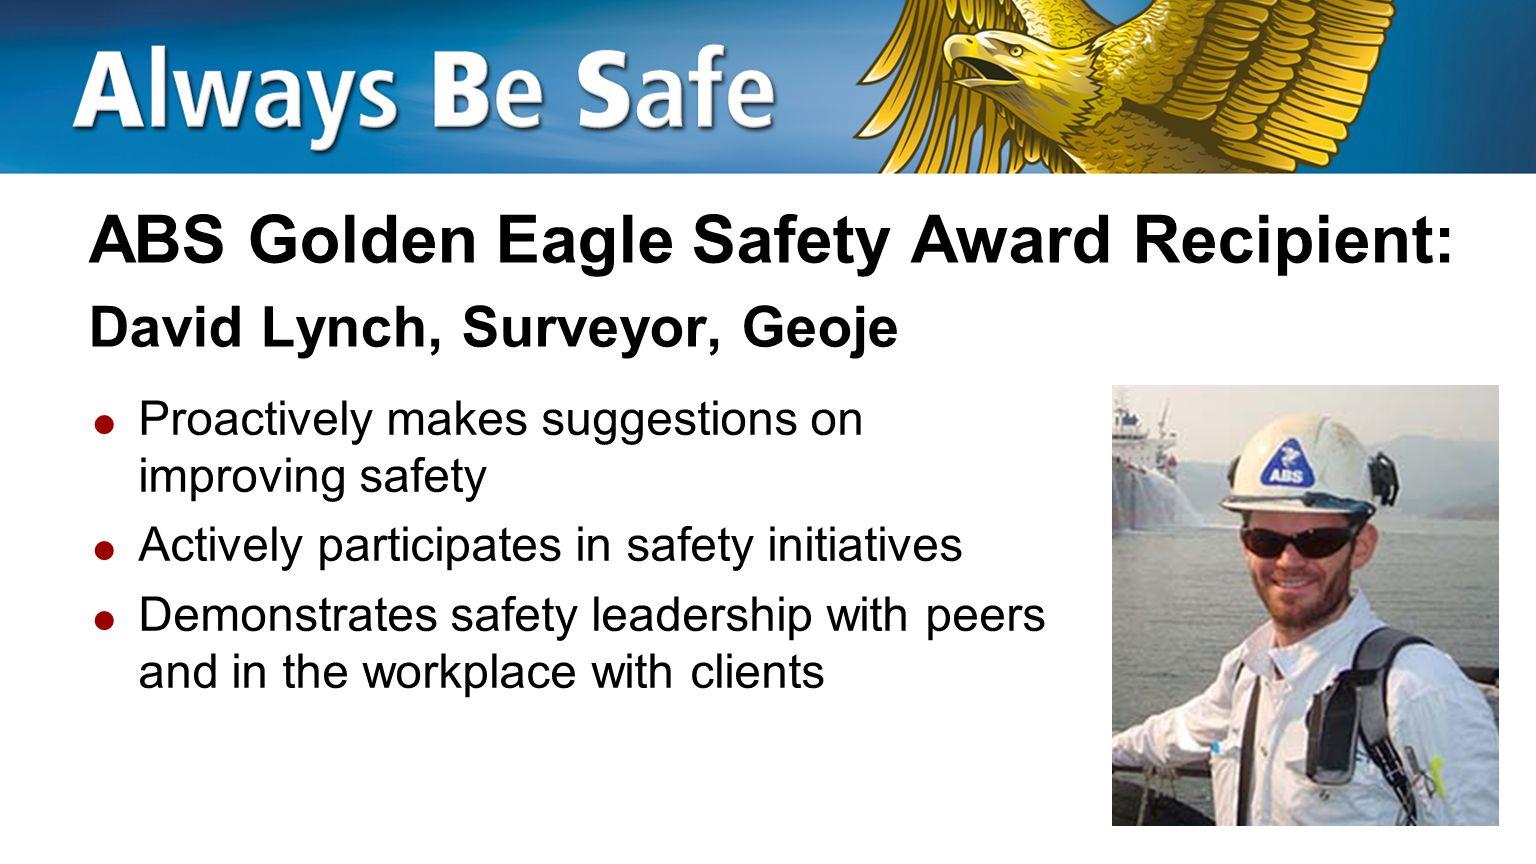 ABS Golden Eagle Safety Award Recipient: David Lynch, Surveyor, Geoje